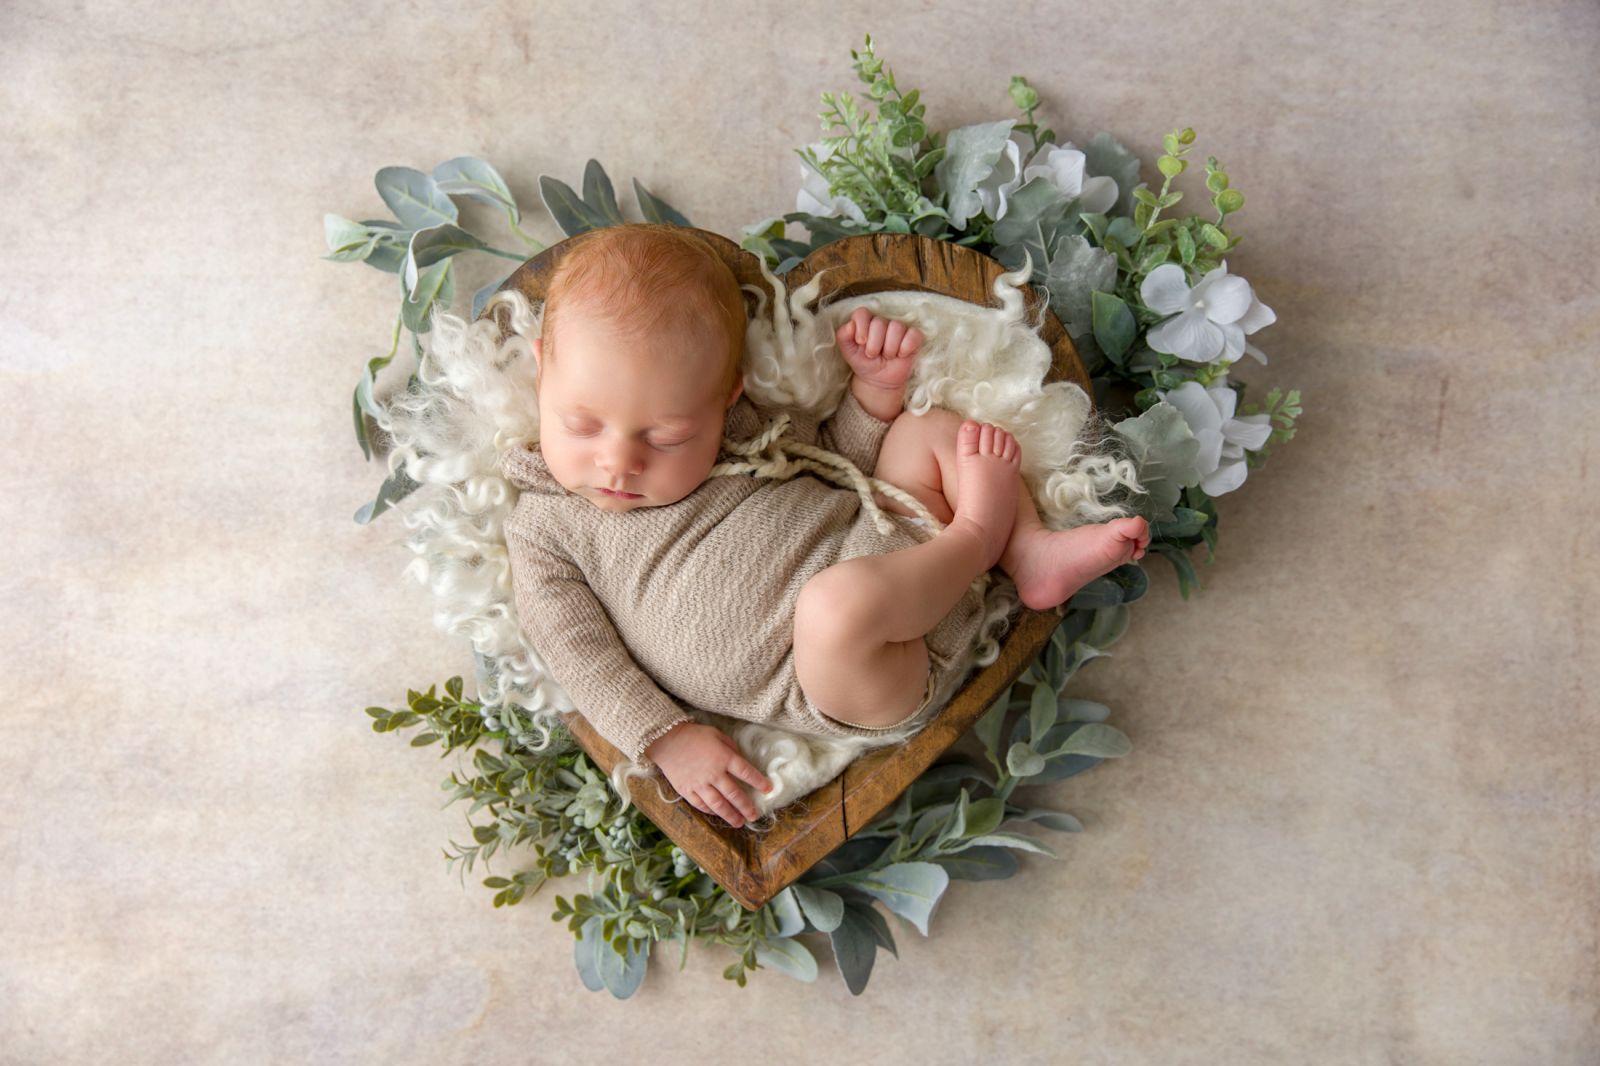 medford oregon newborn photographer